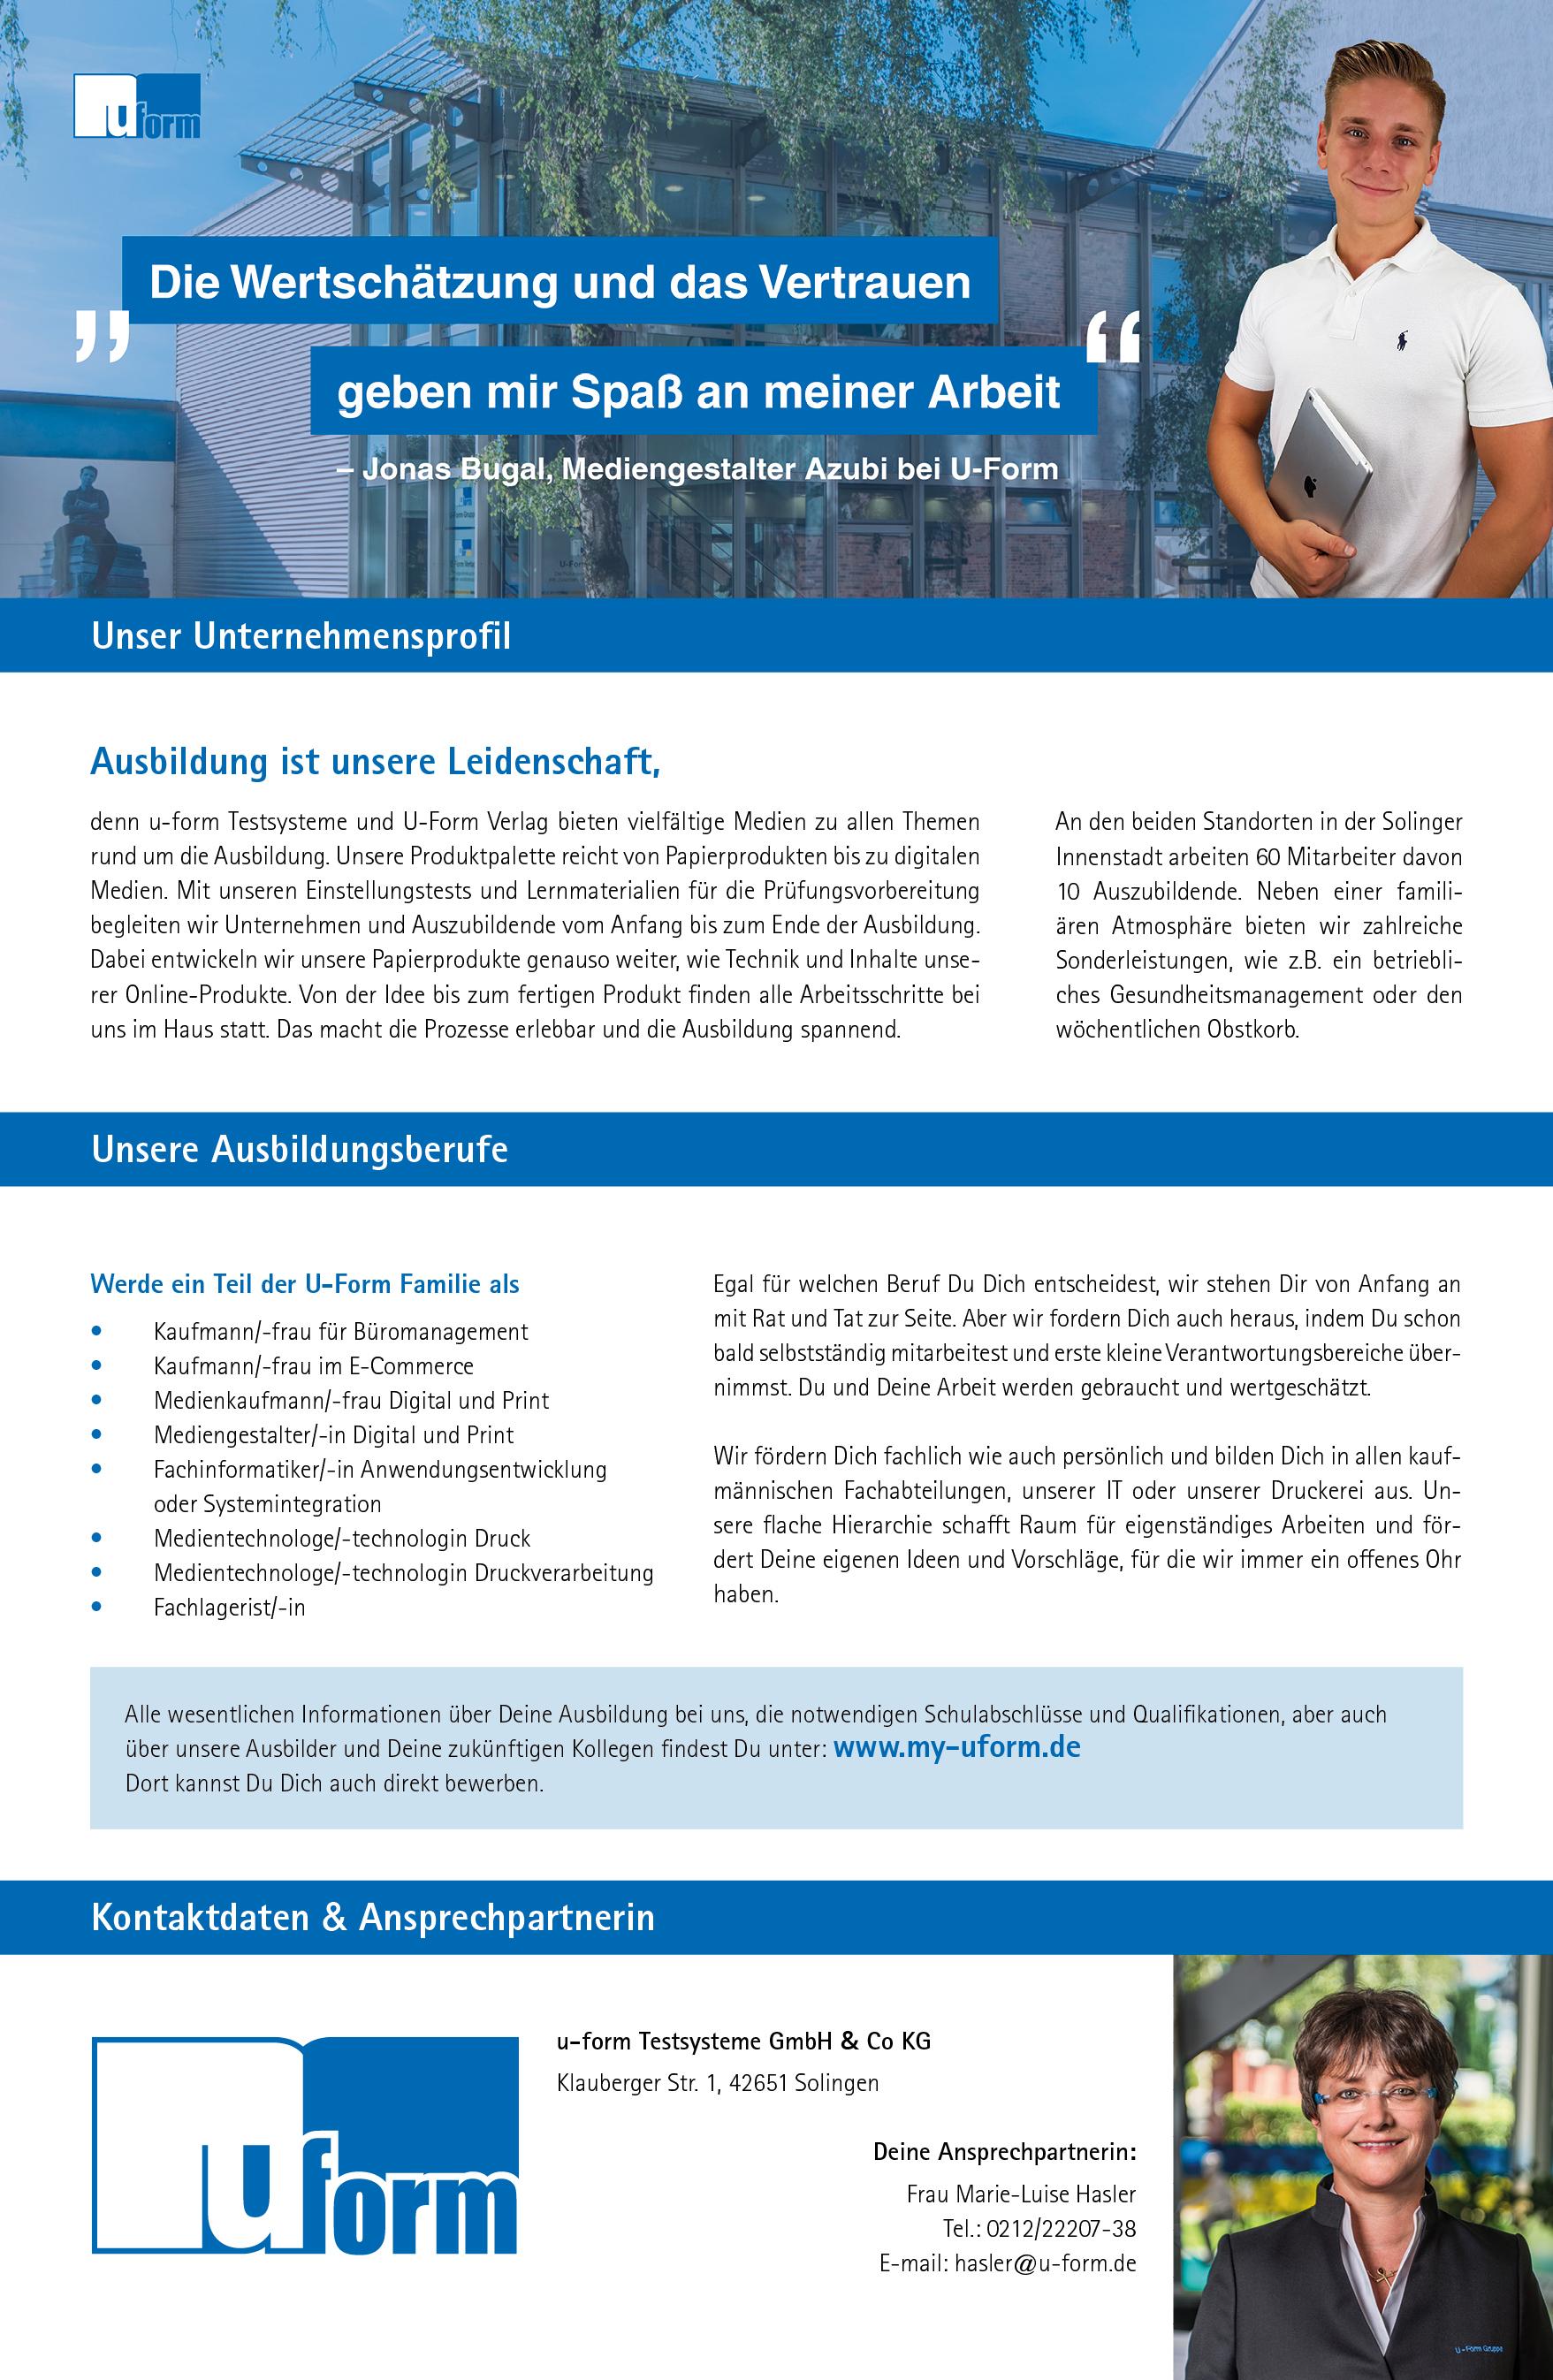 Ausbildungsplakat: u-form Testsysteme GmbH & Co KG